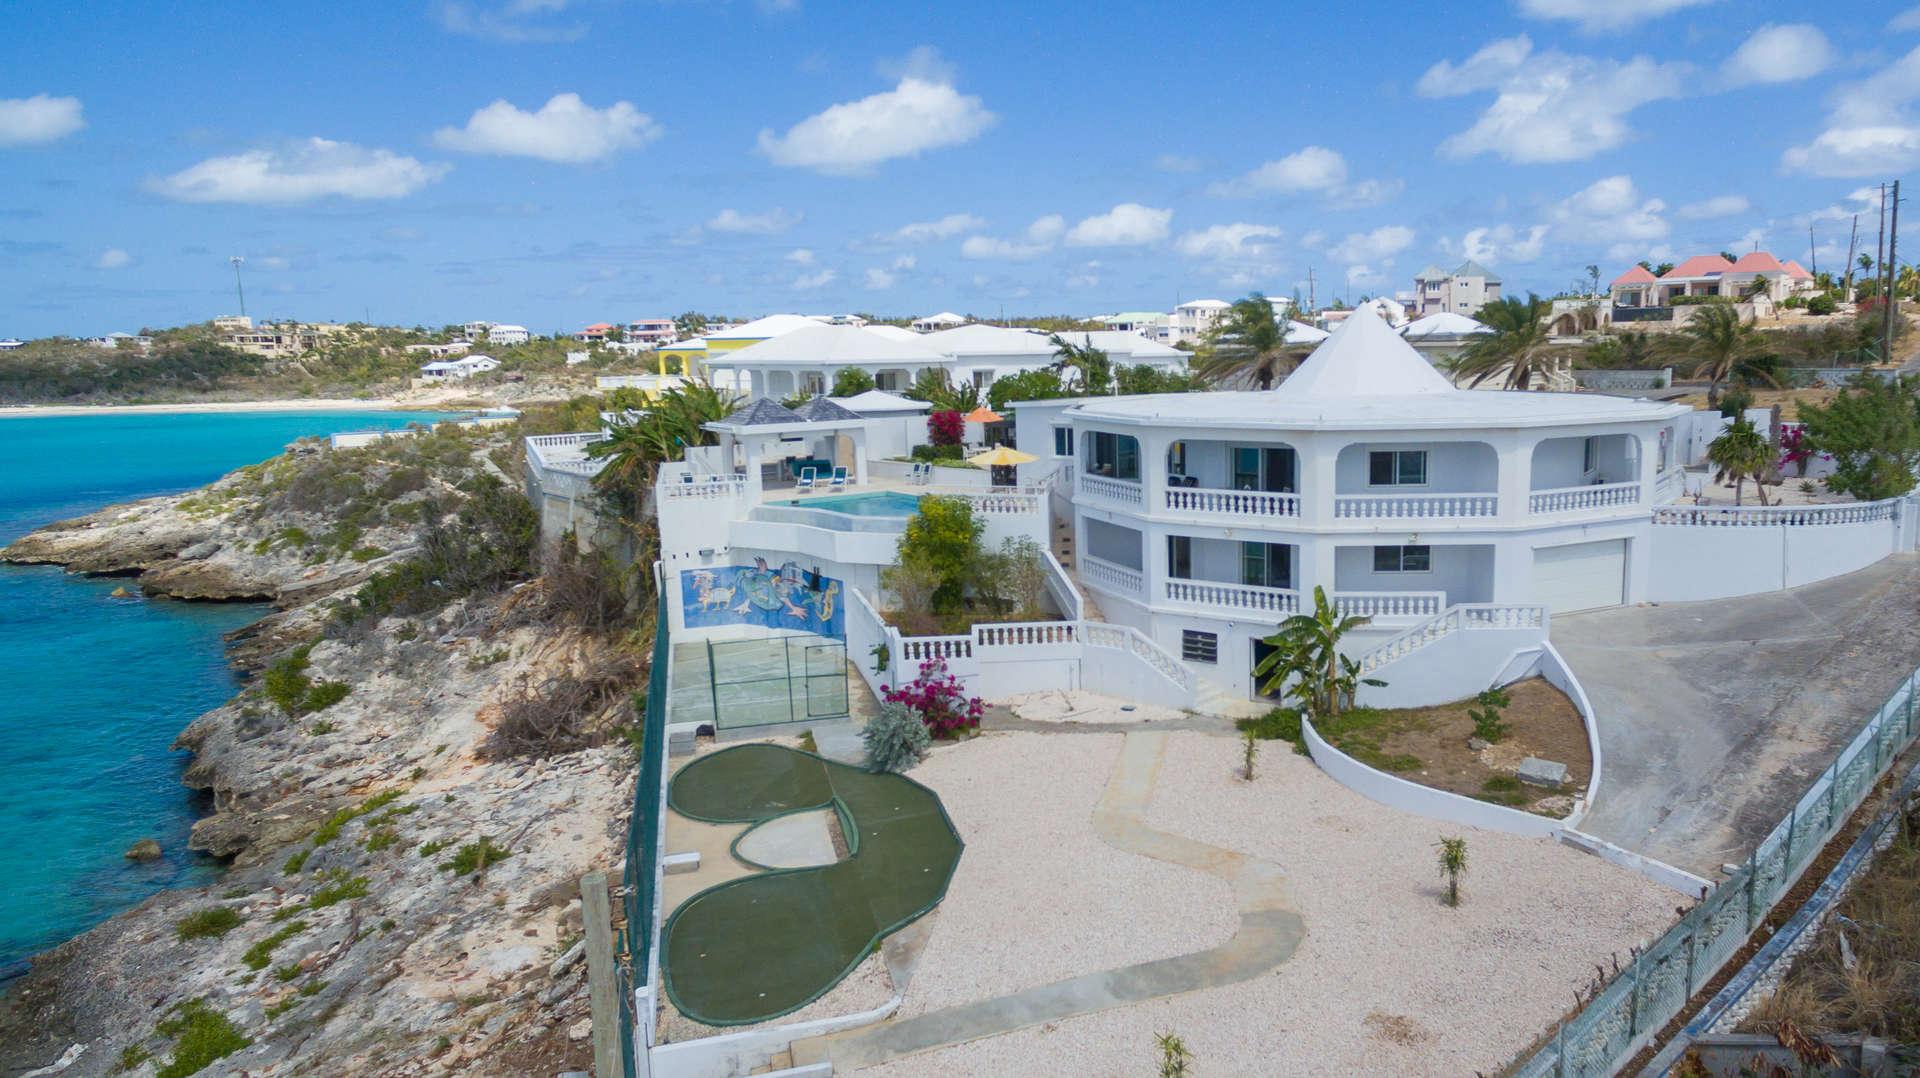 Luxury villa rentals caribbean - Anguilla - Sandy hill - Emerald Reef Villa - Image 1/24